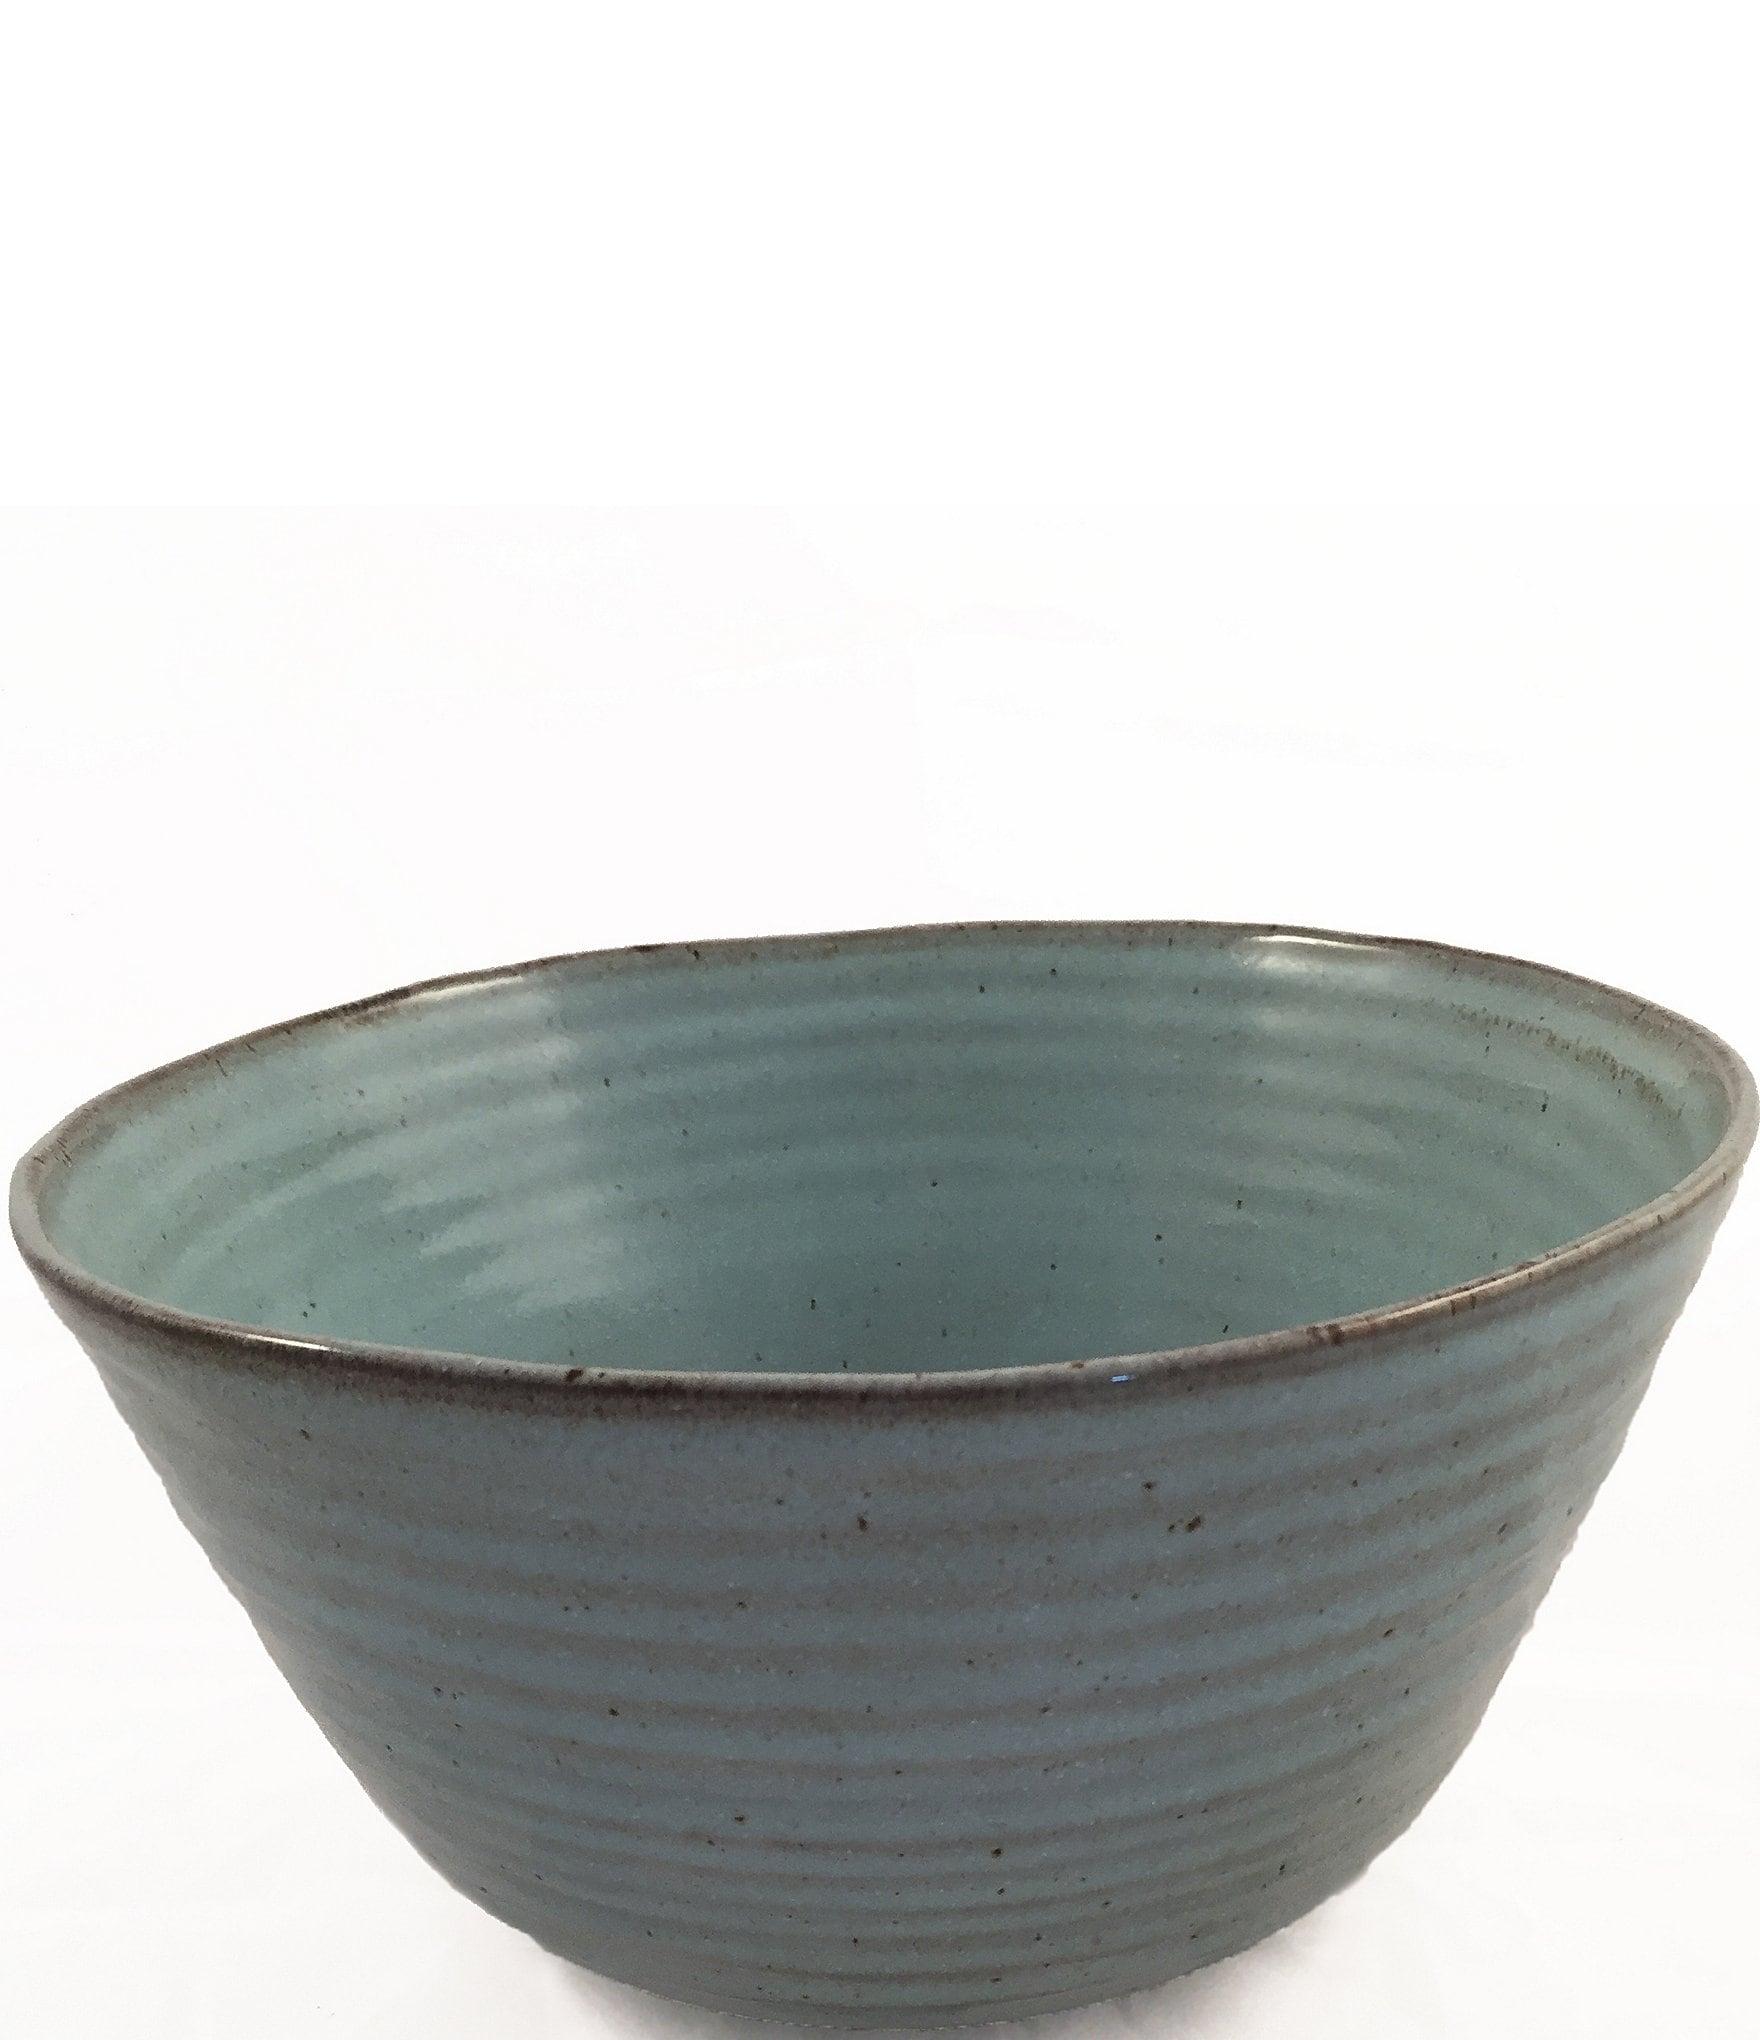 Southern Living Dining & Hosting: Dinnerware, Glassware & Serveware ...